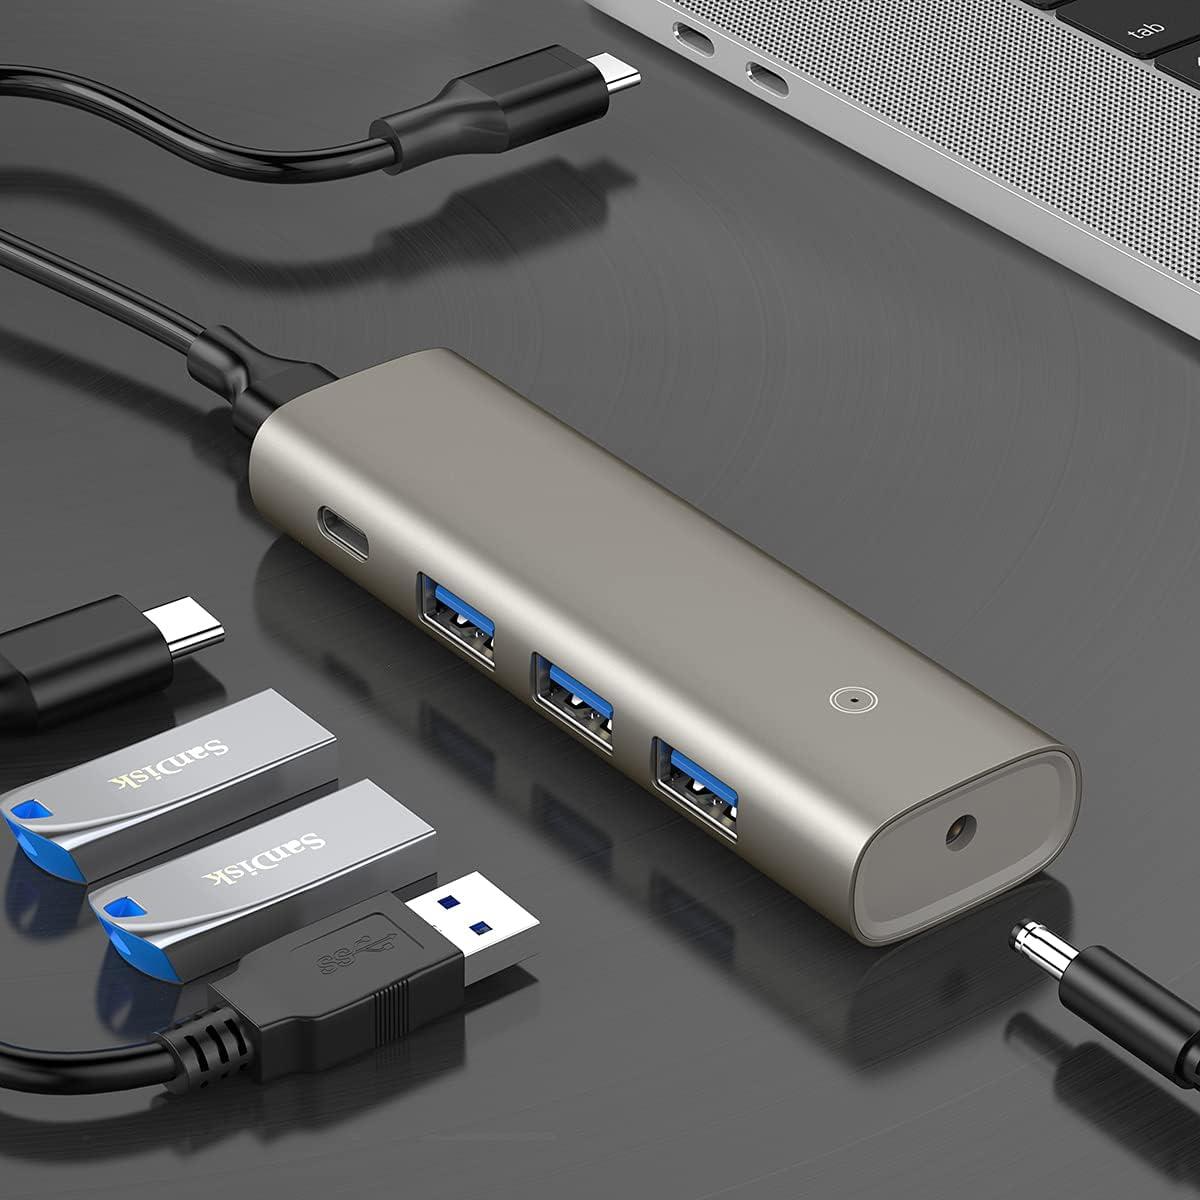 10Gbps USB C Hub Docking Station USB 3.2/3.1 Gen 2 Data Hub Type C Multiport Adapter with 3 USB 3.0 Ports, 1 USB C Port Bus Powered USB C Dock Data USB Splitter for MacBook/Surface/Samsung Galaxy...